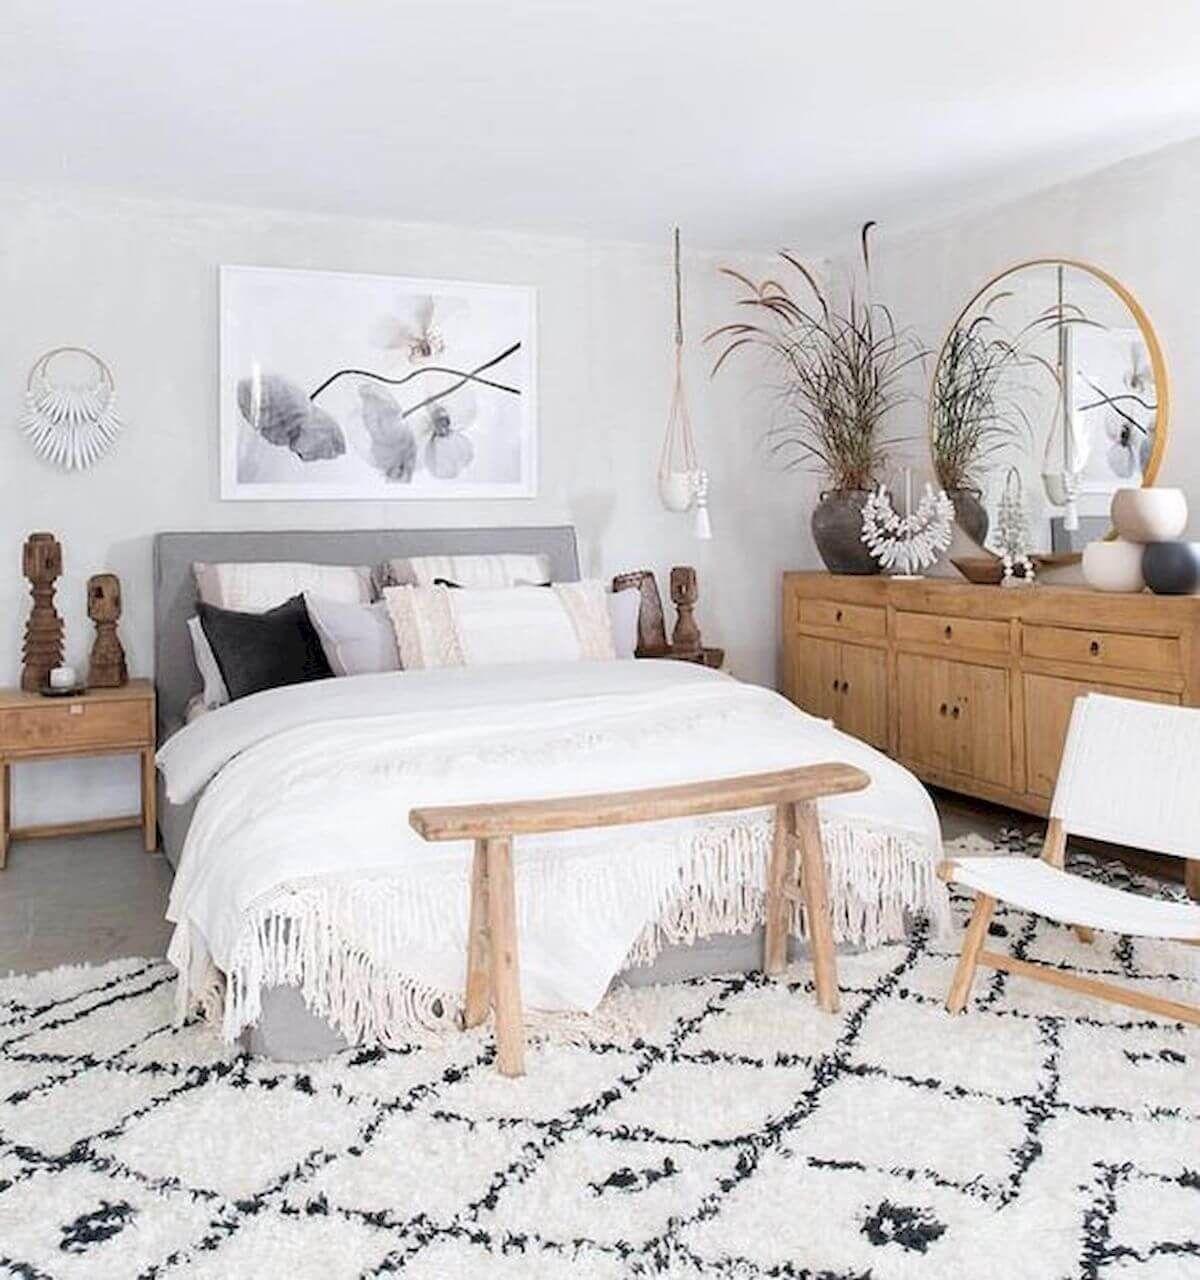 29+ Bedroom furniture ideas 2021 info